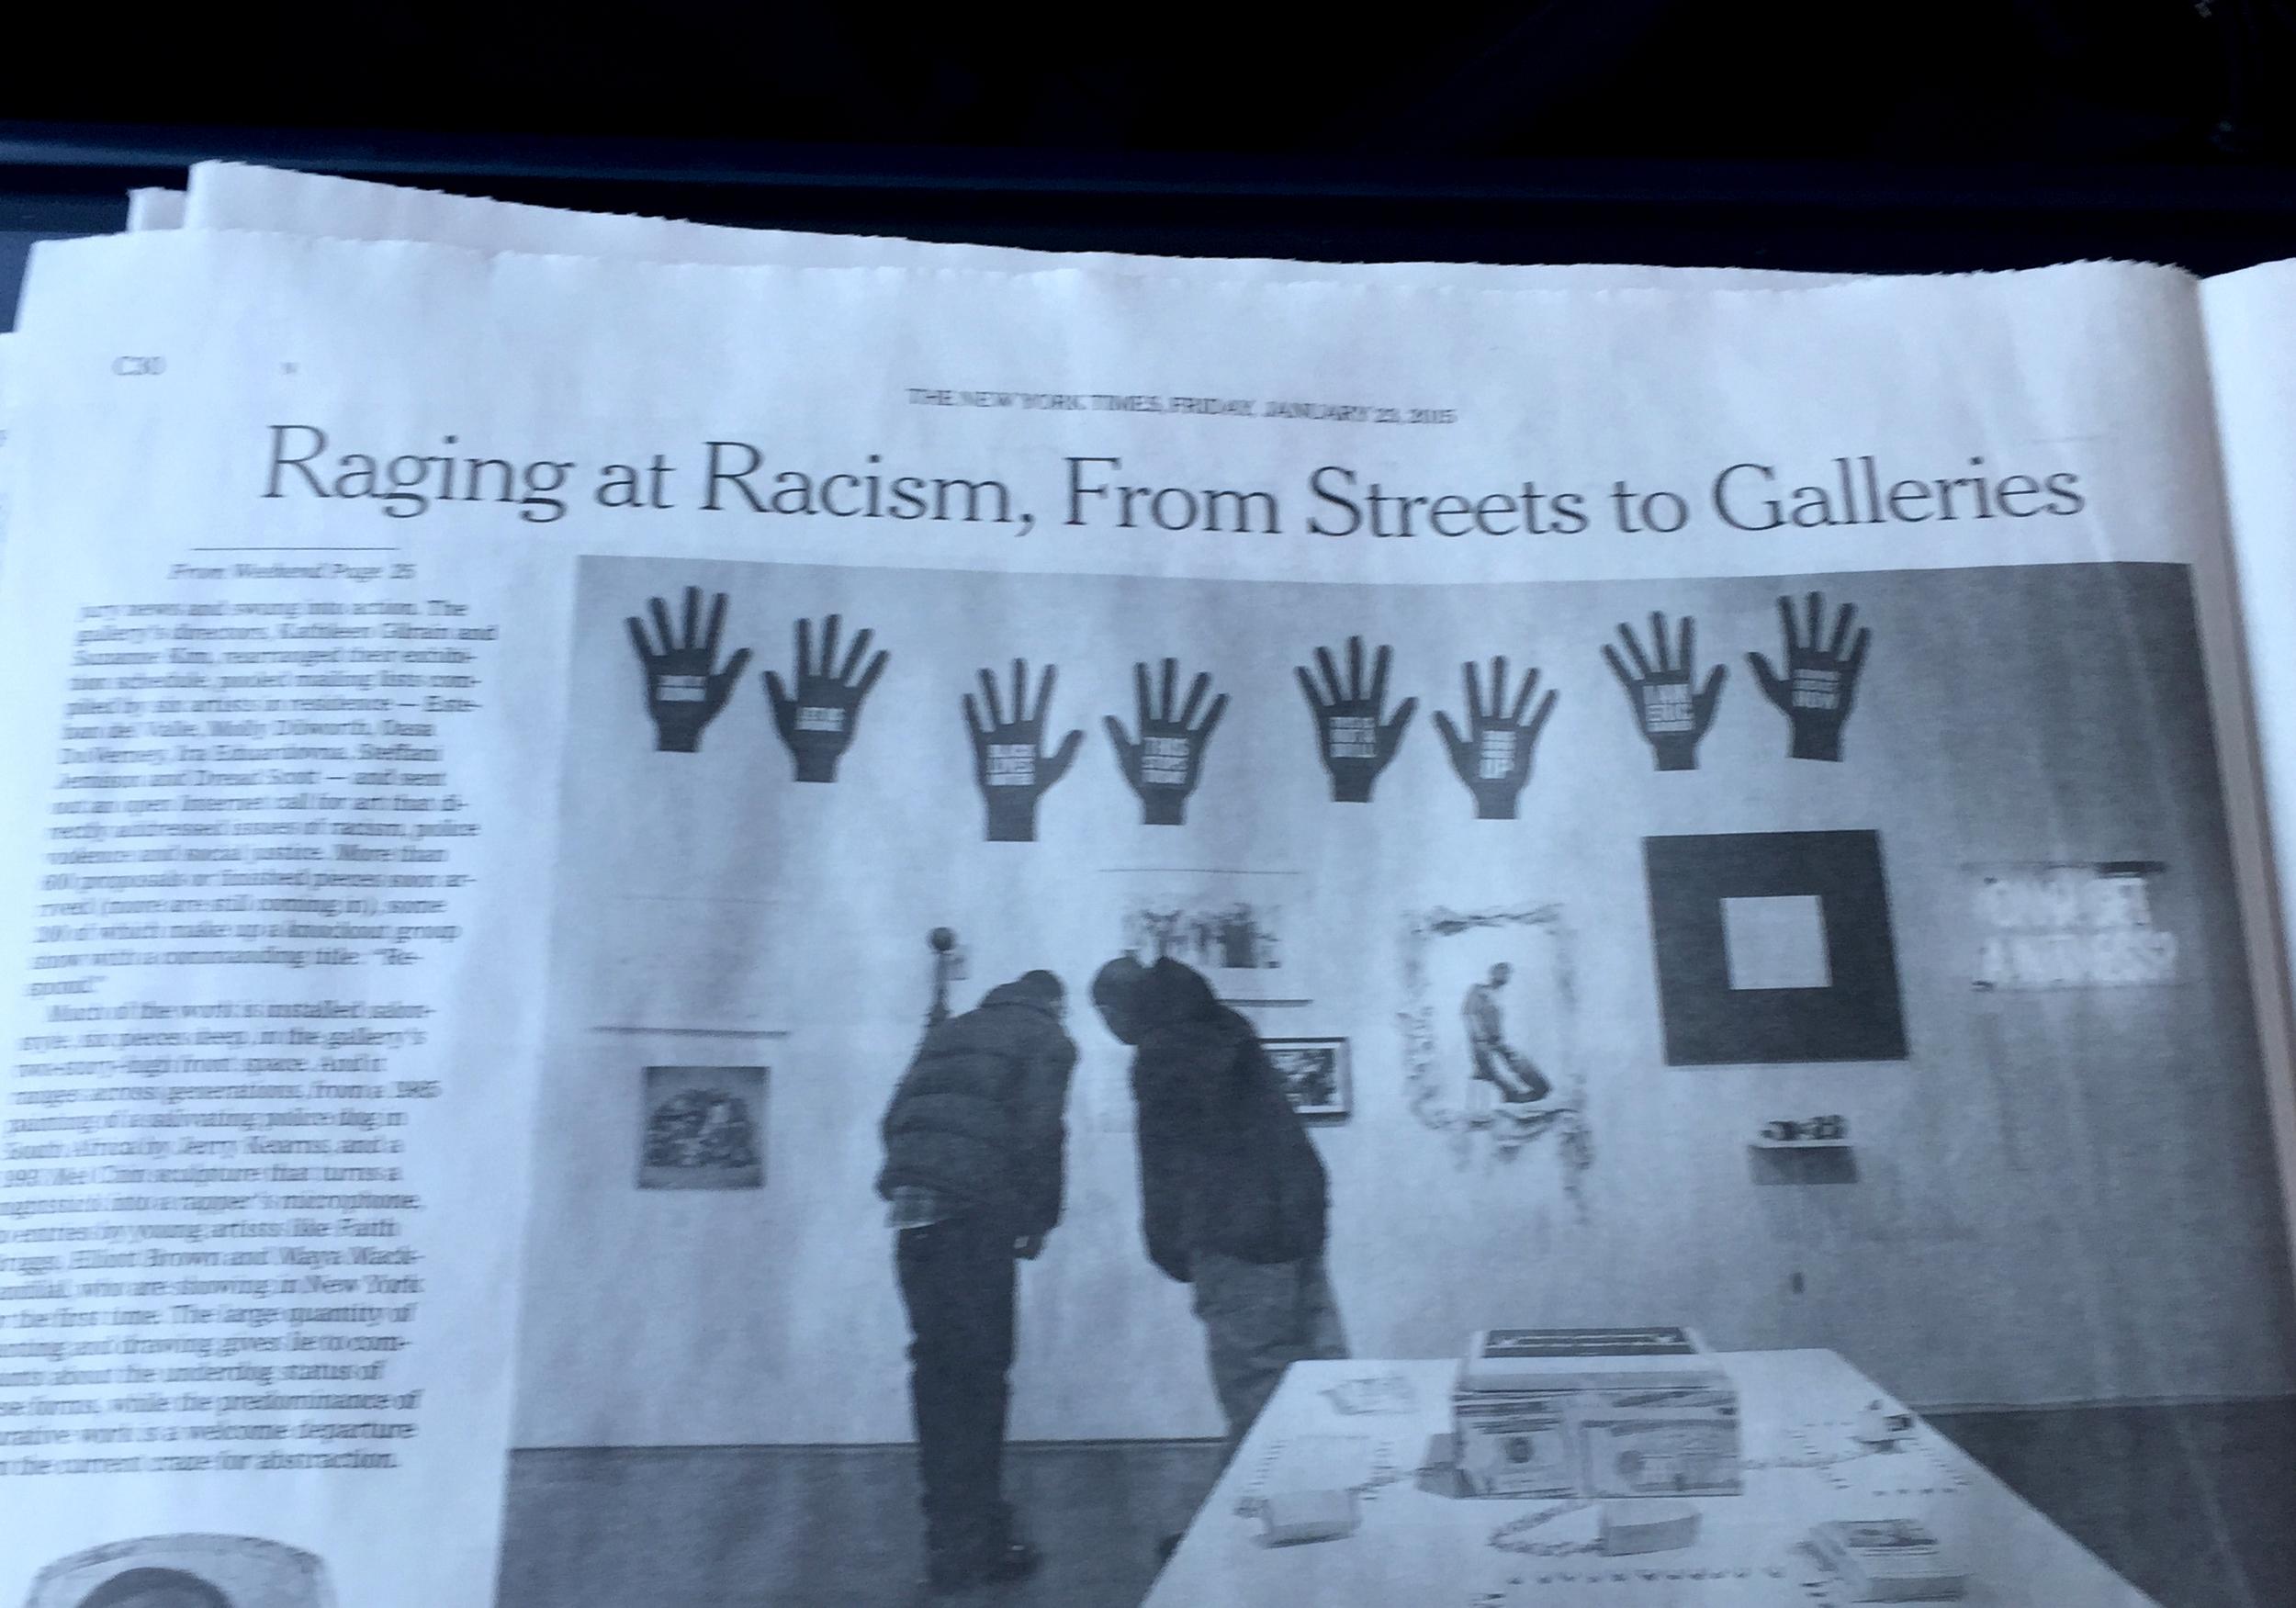 handsup_nytimes.jpg